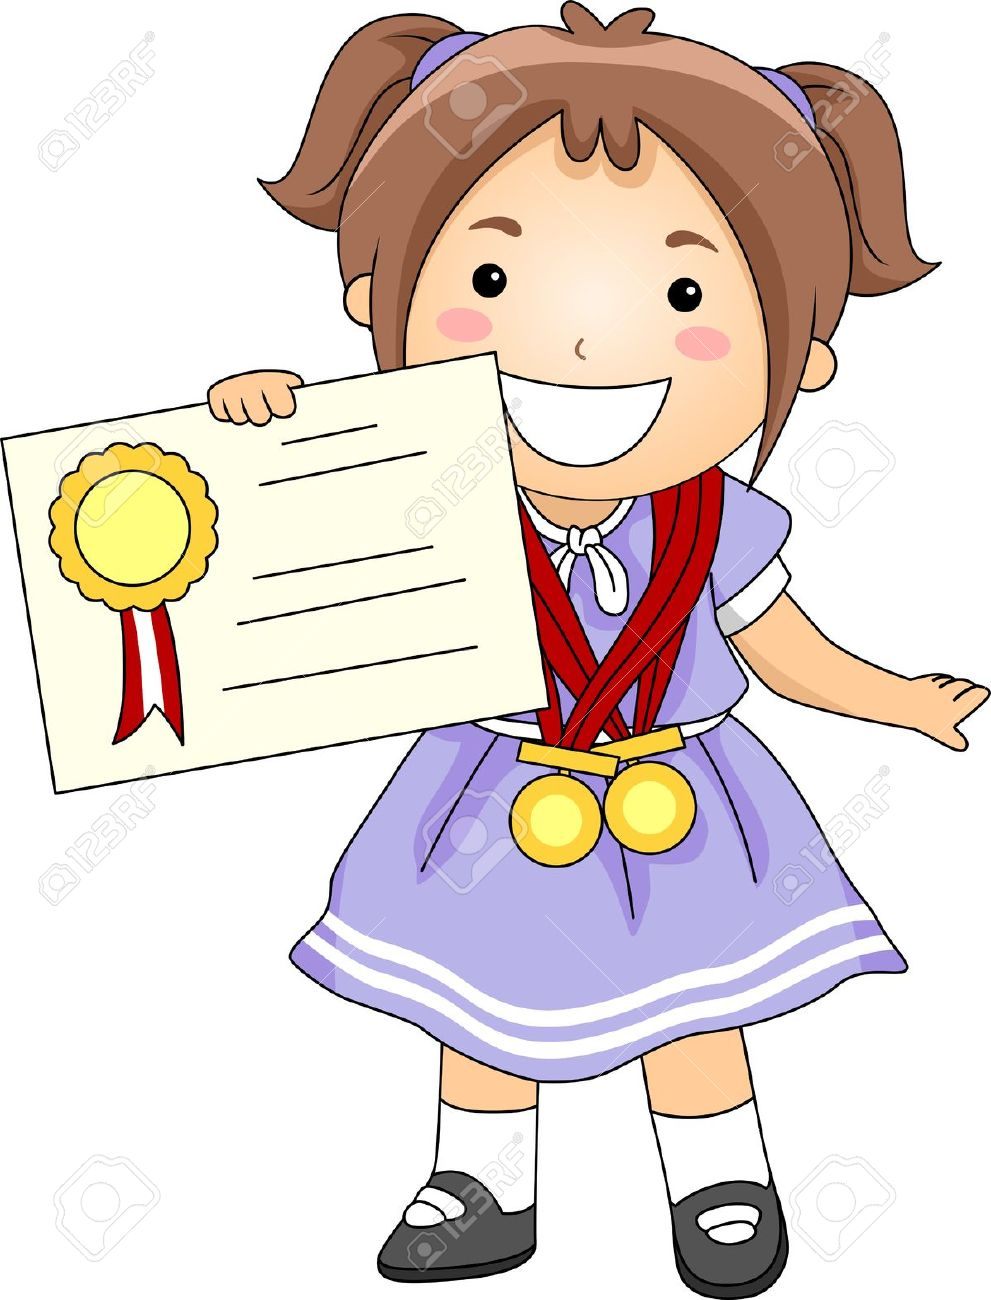 Student Award Clipart.